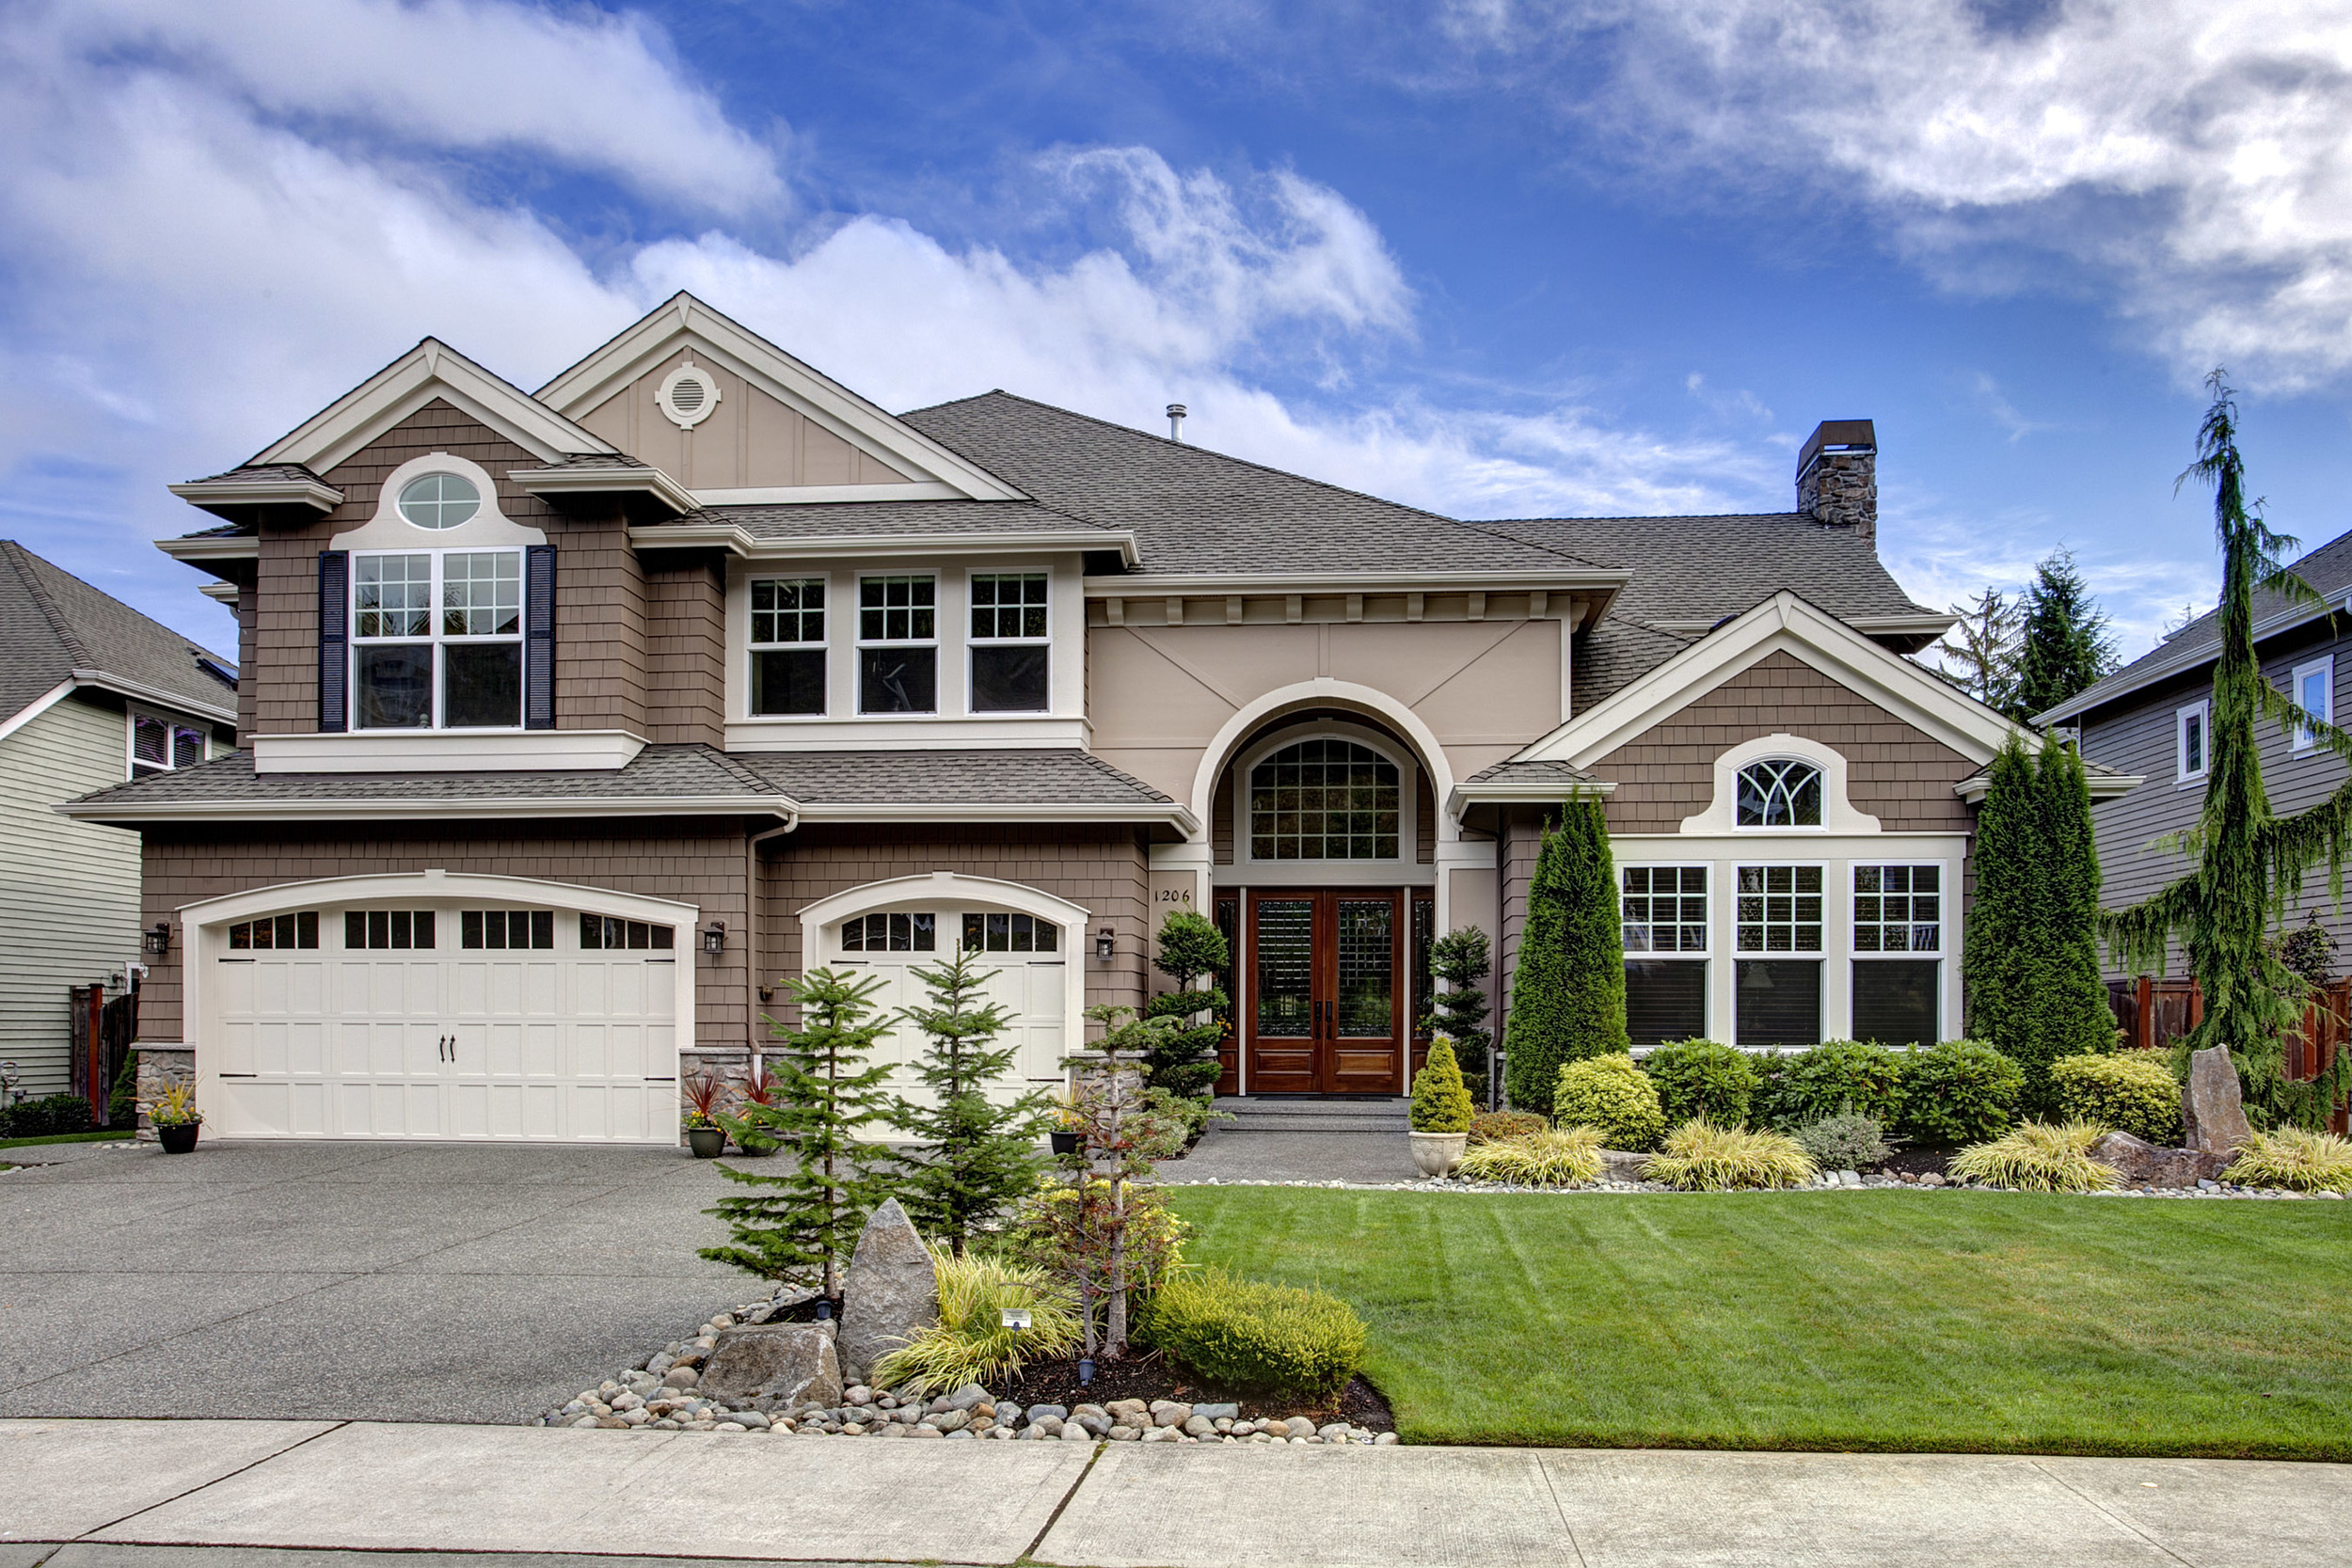 Cedar Cove - $1,090,000